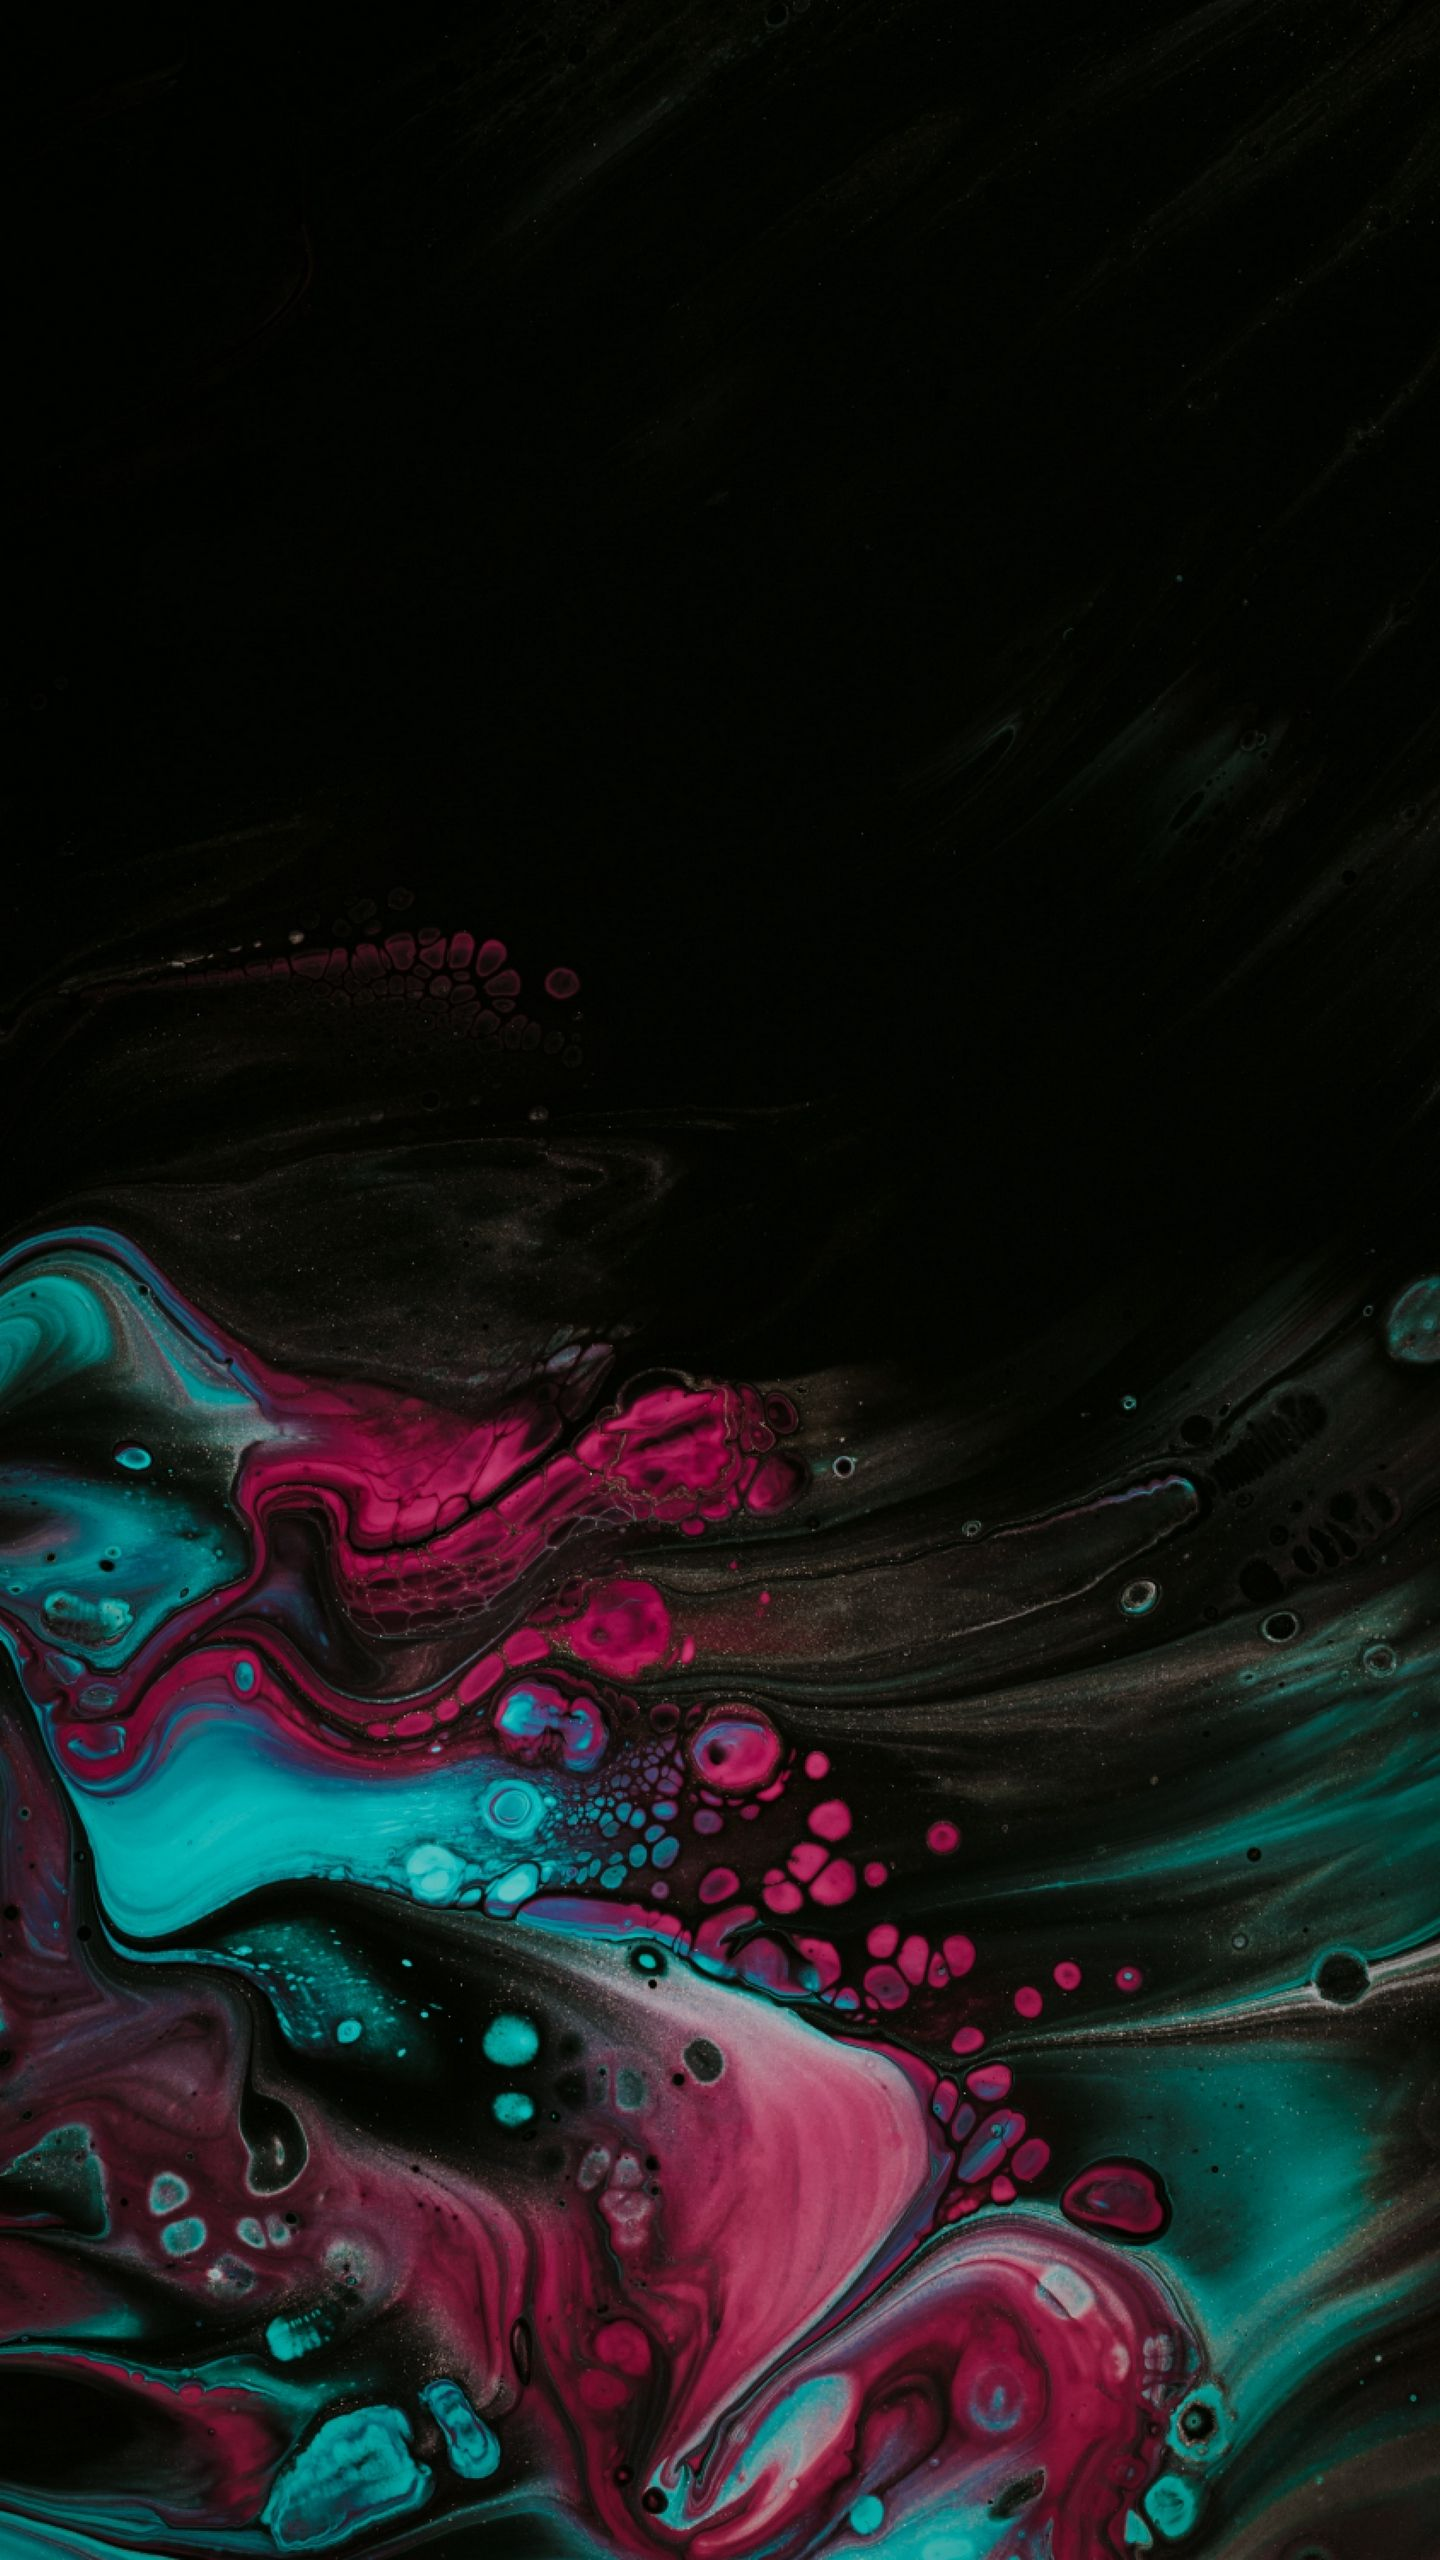 Download Wallpaper 1440x2560 Paint Spots Stains Mix Liquid Colorful Qhd Samsung Galaxy S6 S7 Edge N Dark Wallpaper Painting Wallpaper Samsung Wallpaper